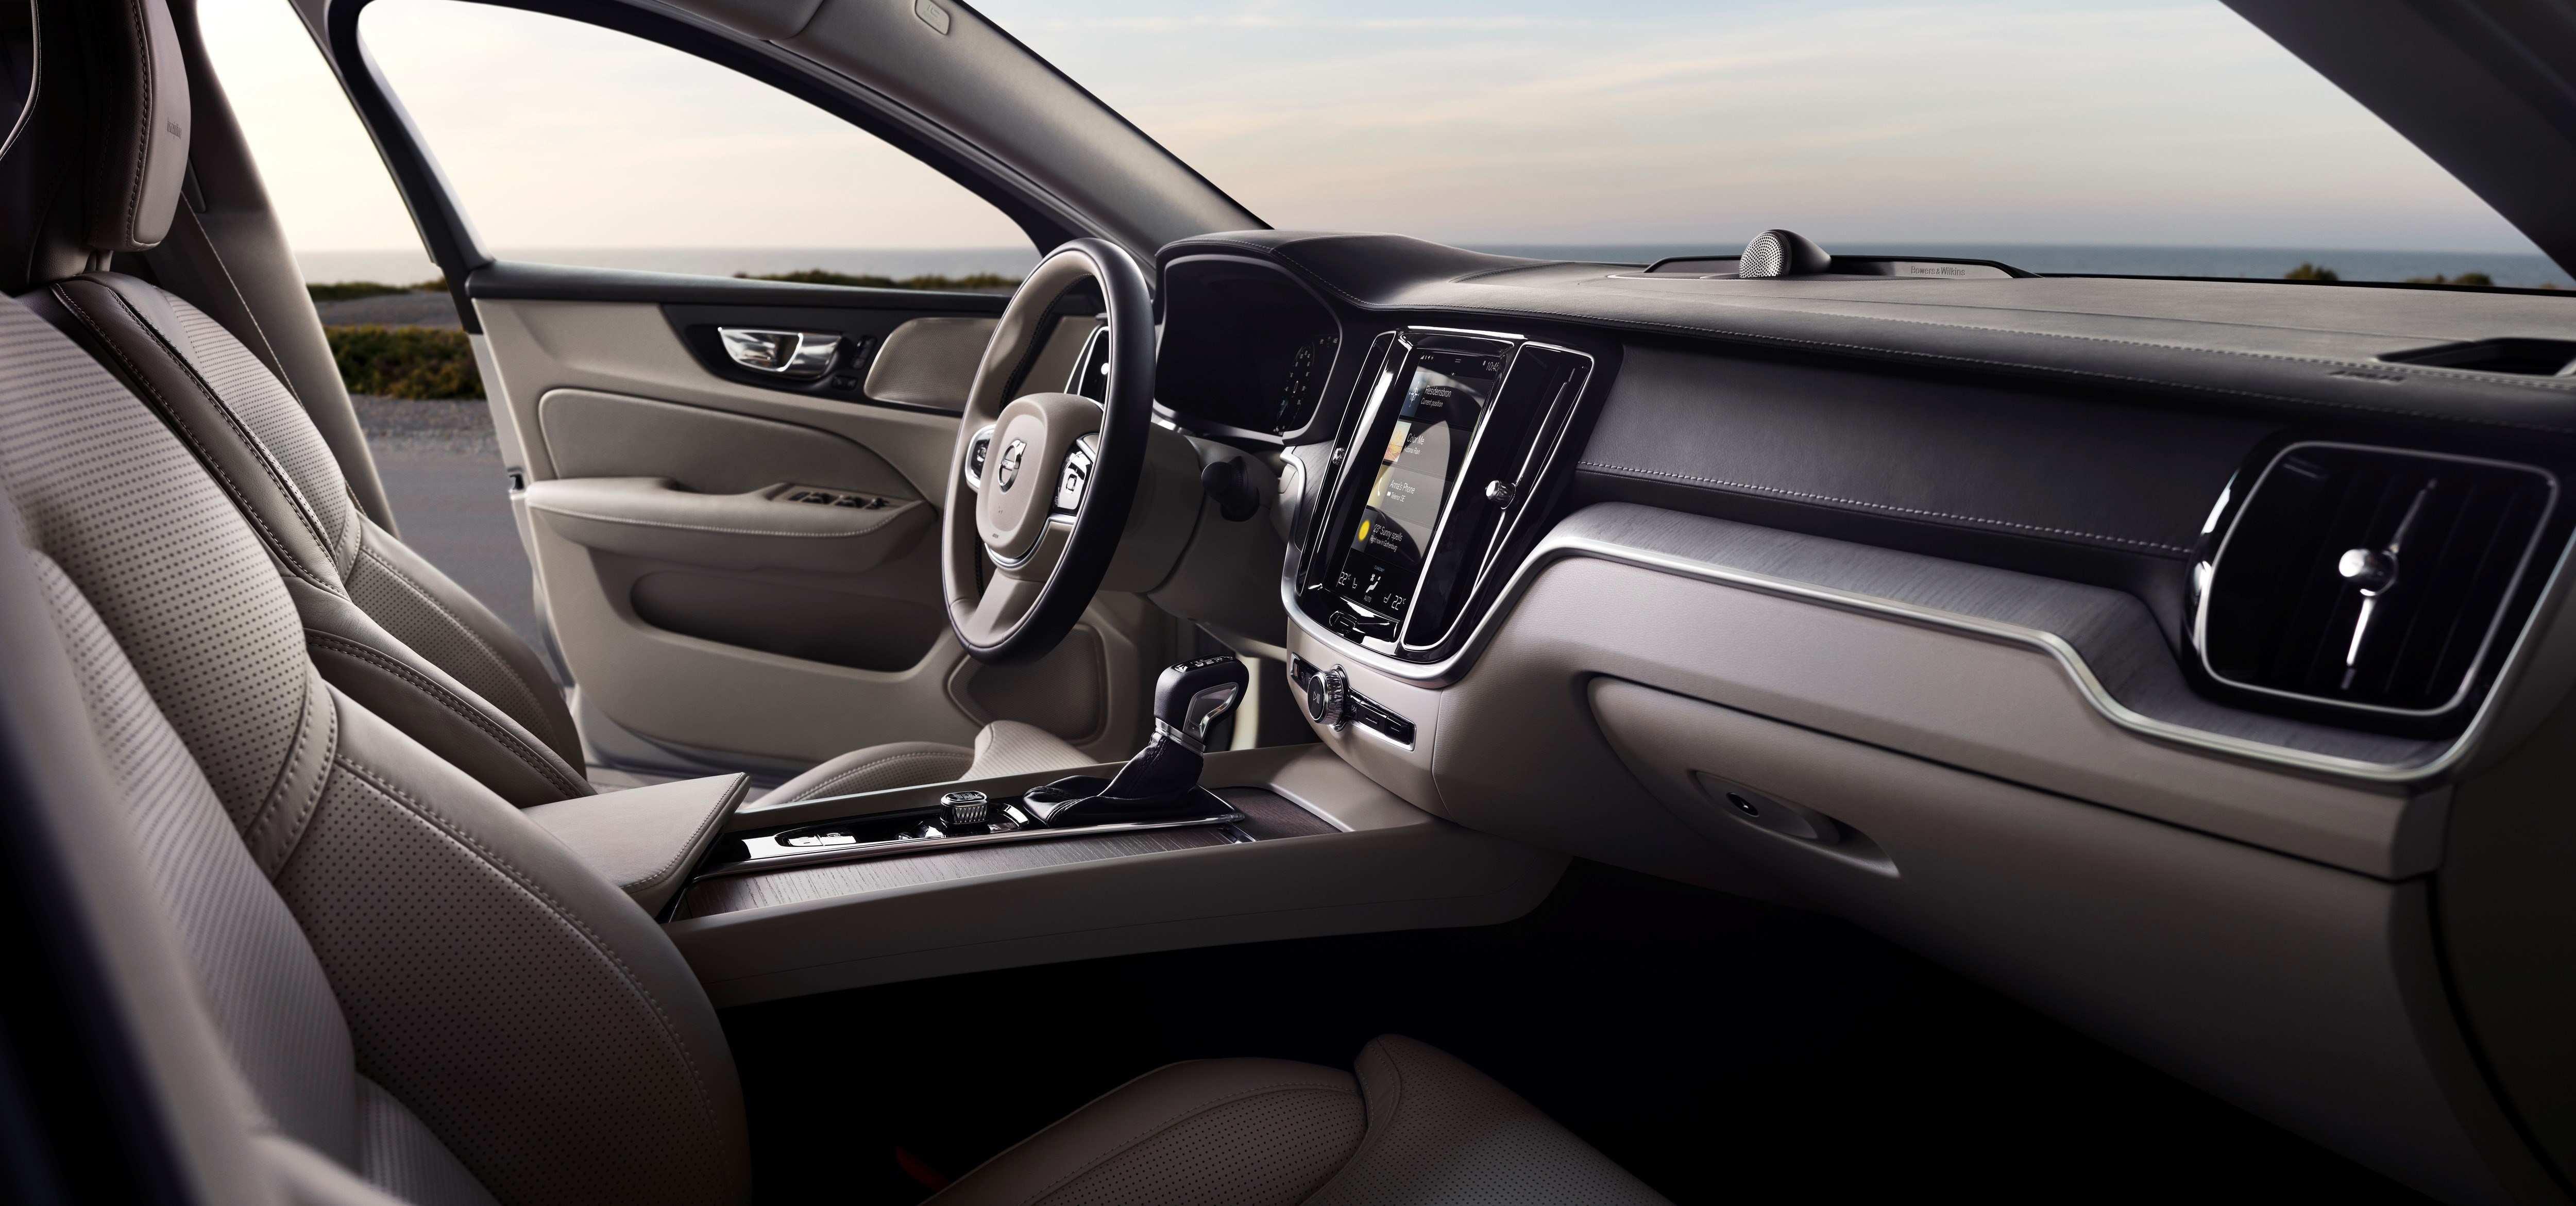 73 Best Review Volvo 2019 Interior Rumors for Volvo 2019 Interior